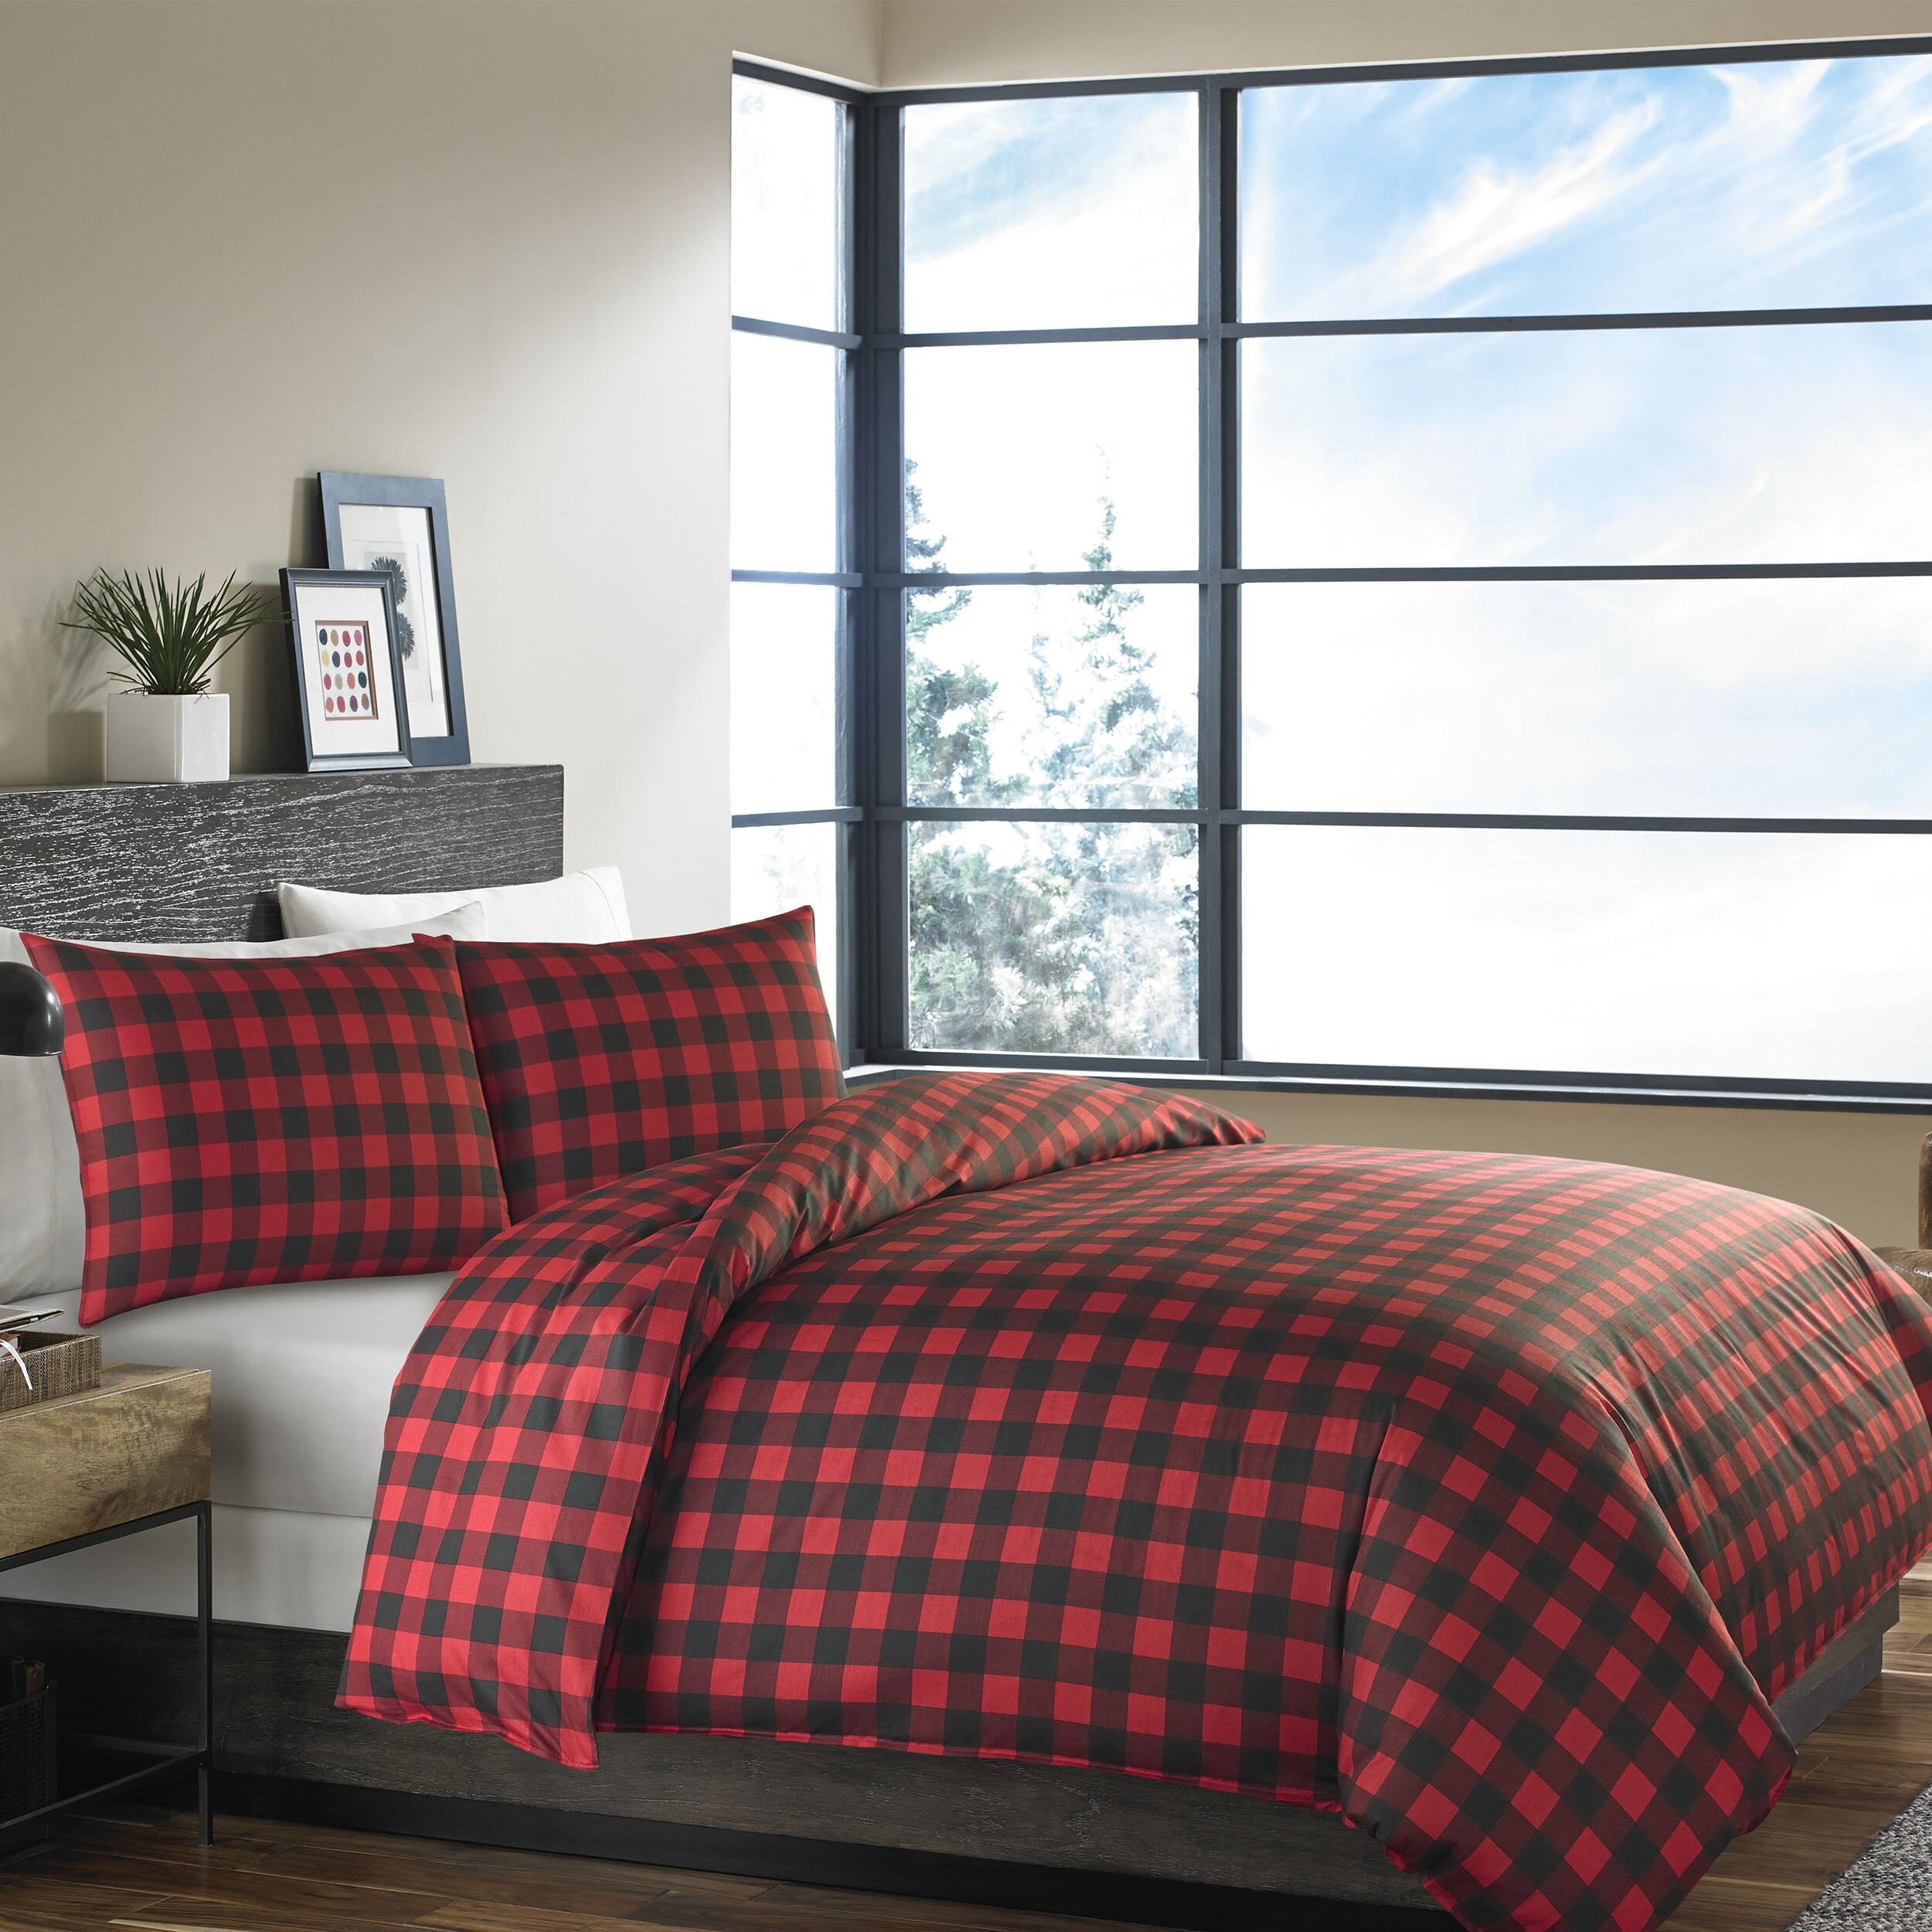 Eddie Bauer Mountain Plaid 3 Piece Reversible Comforter